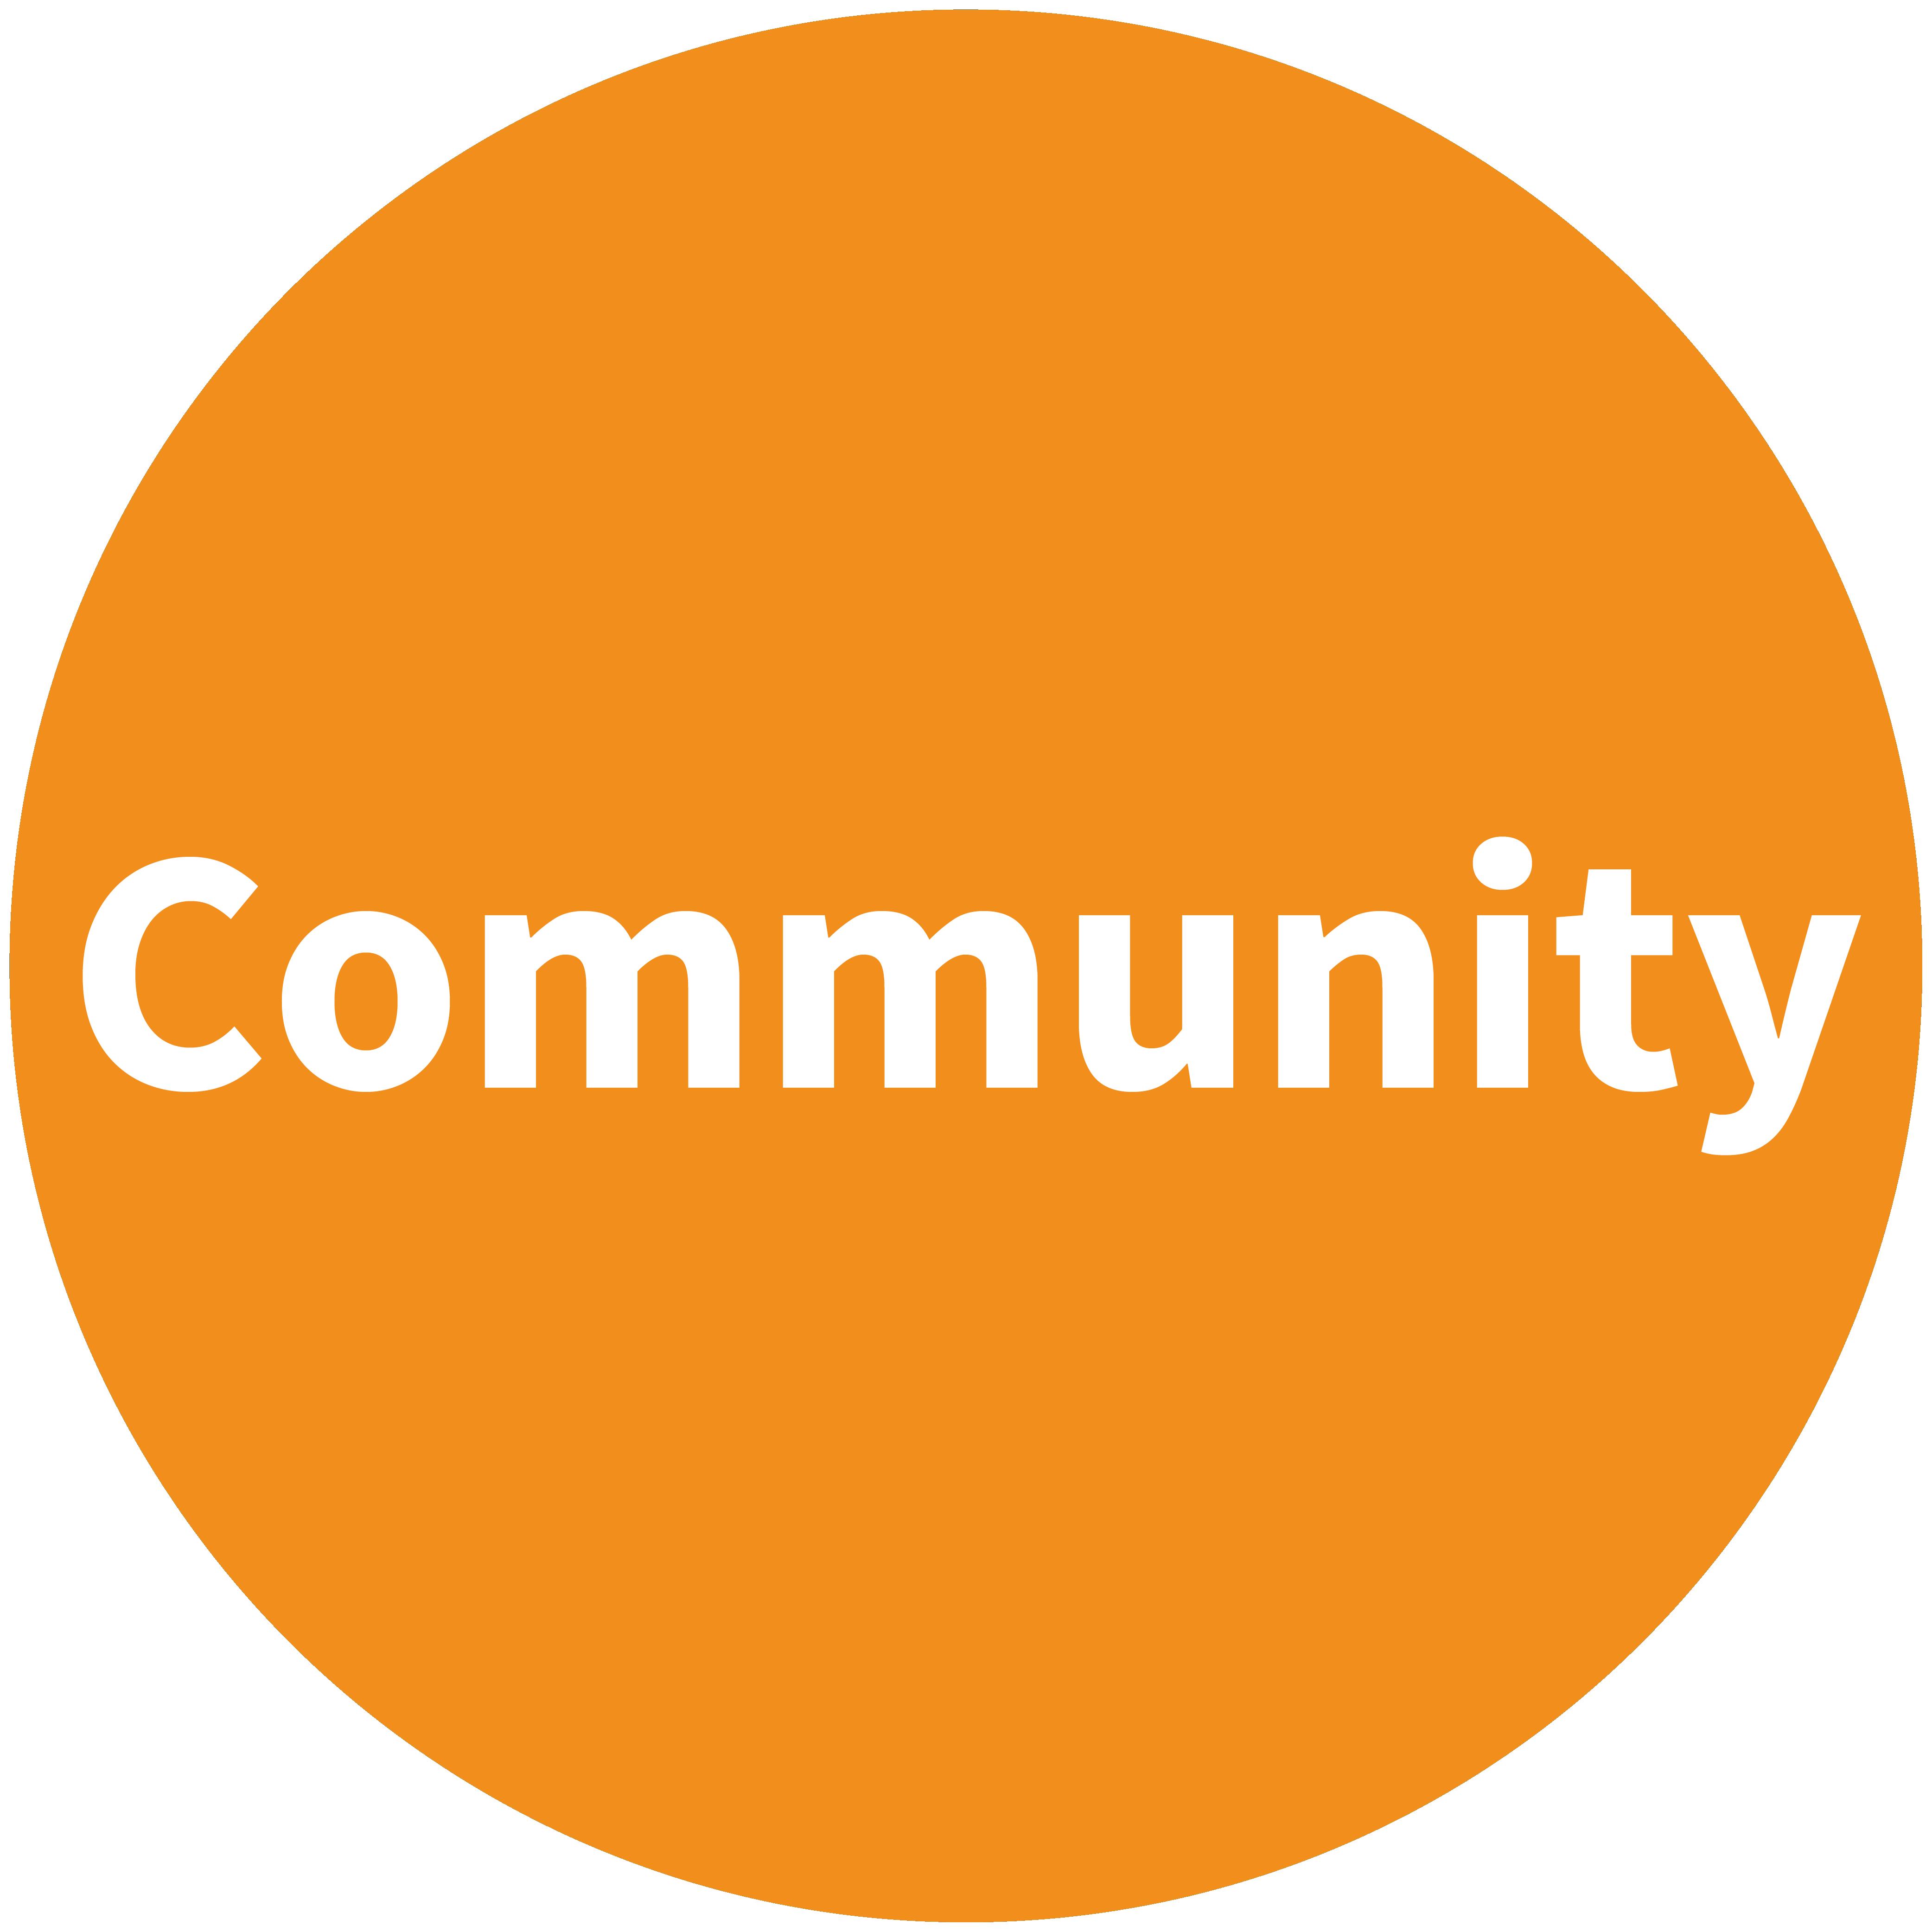 Visit the Brunata.One community webpage